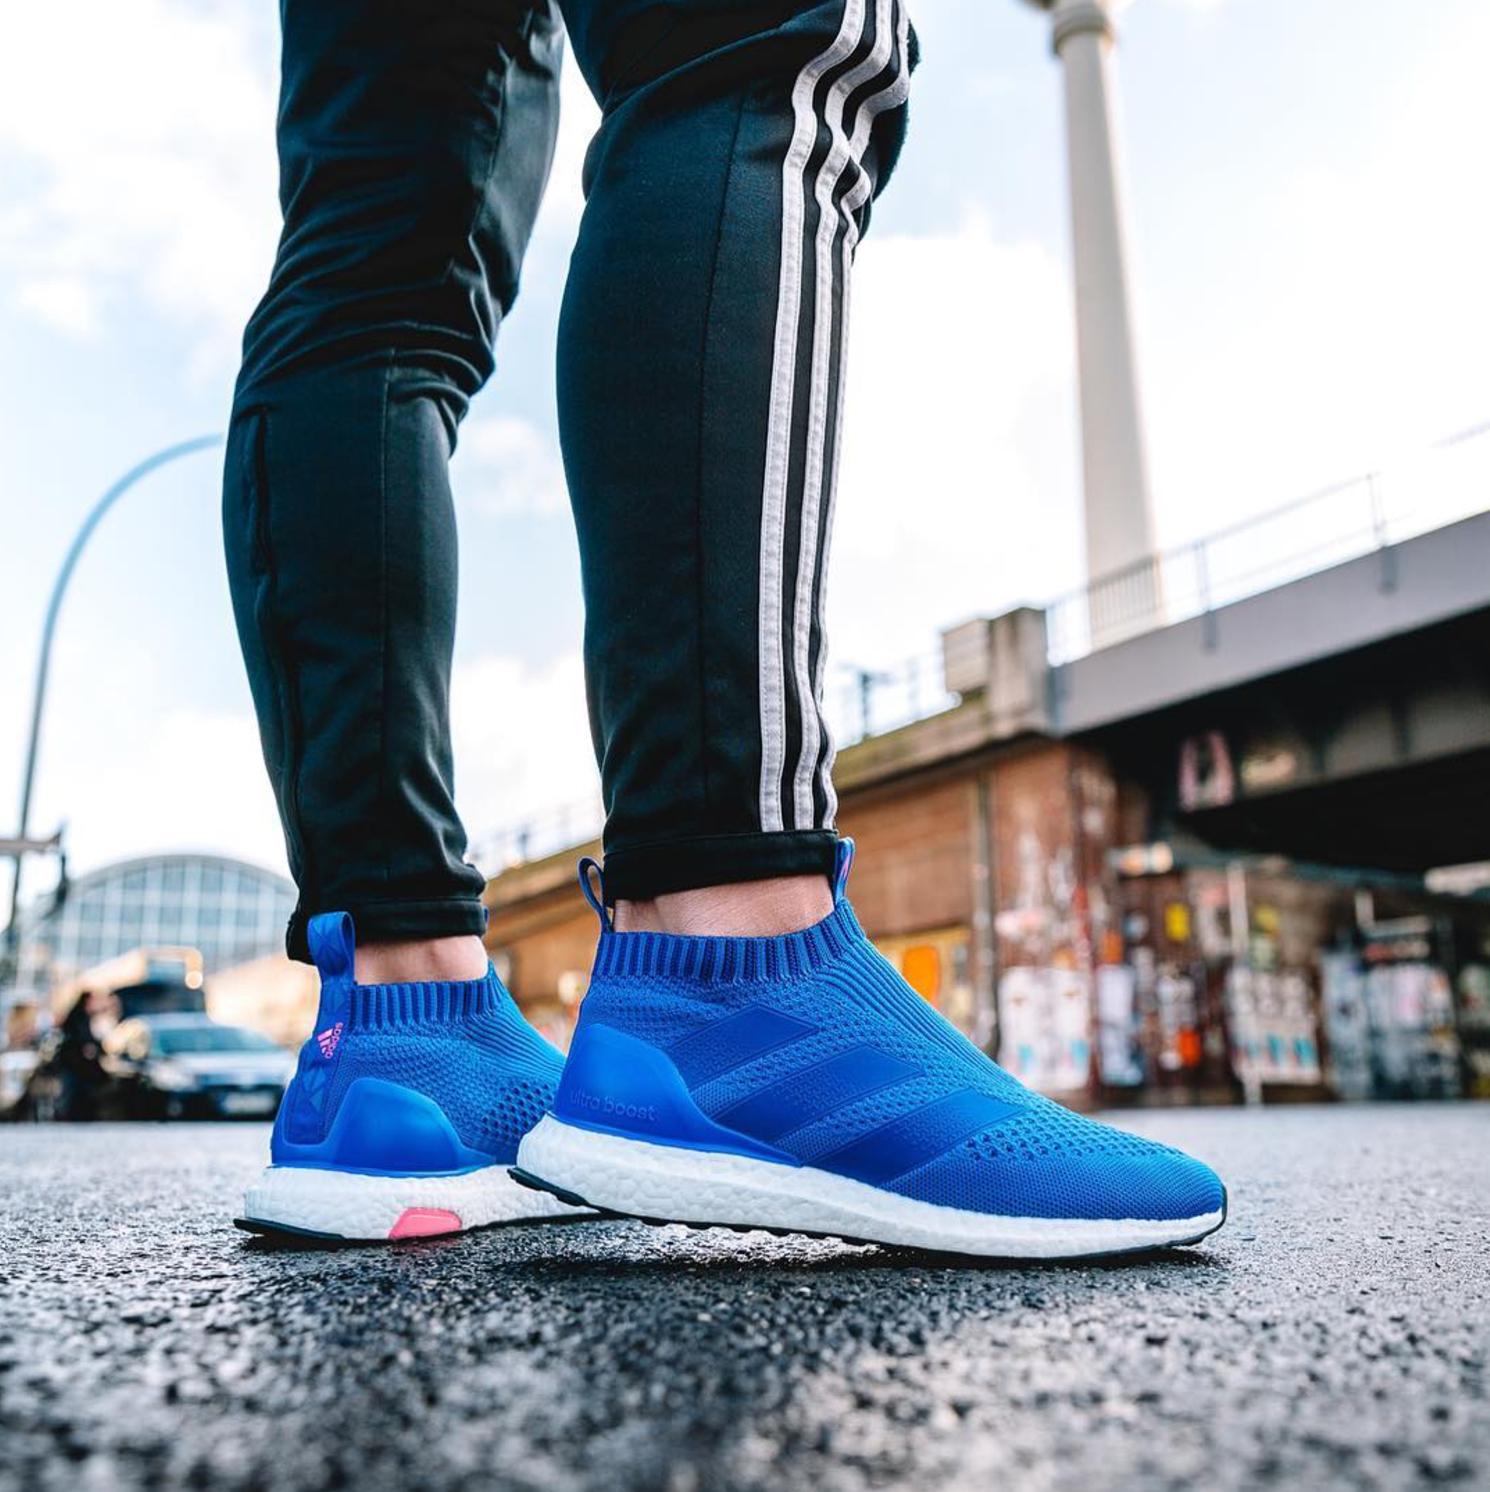 adidas Blue Blast ACE 16+ UltraBoost 1